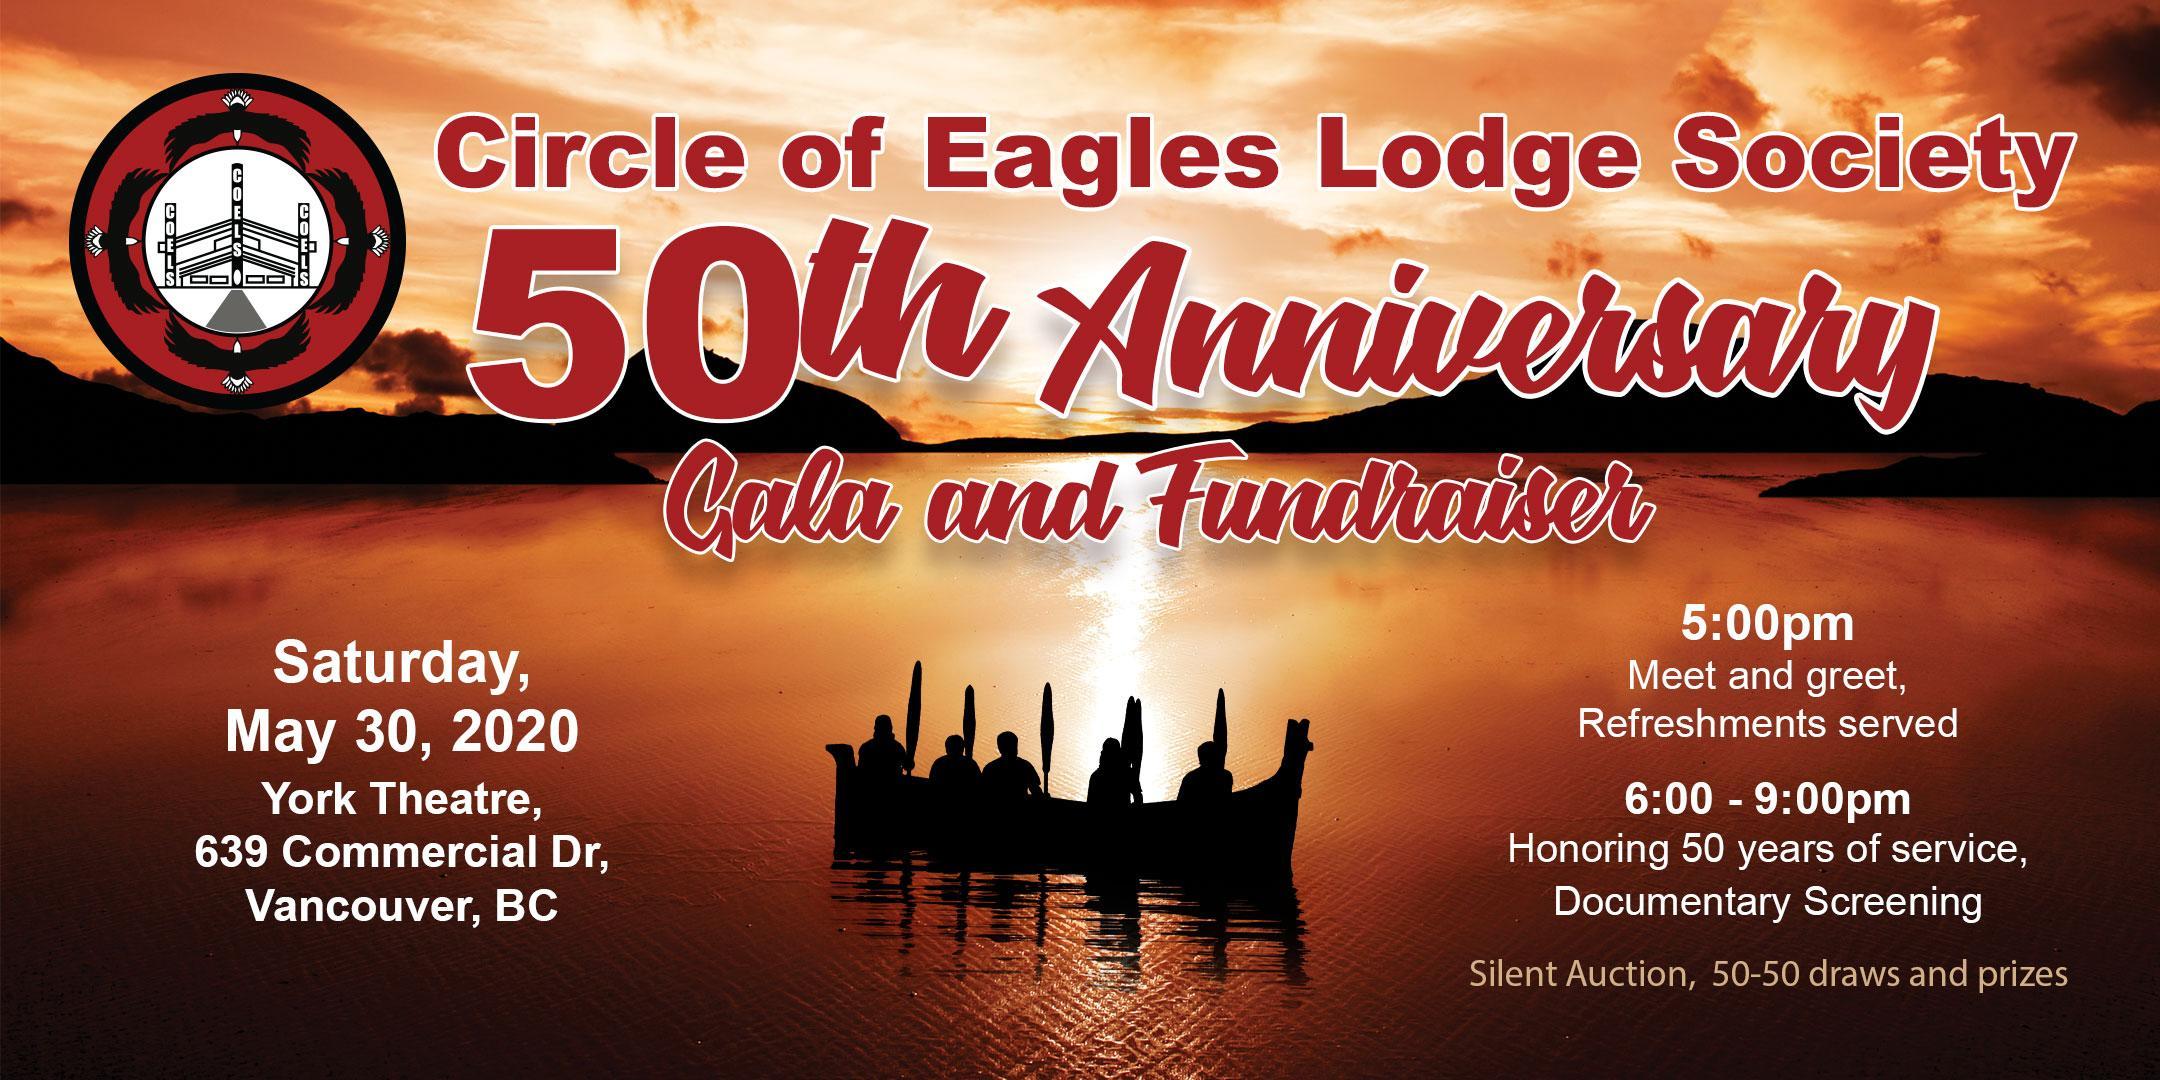 Circle of Eagles Lodge Society - 50th Anniversary Gala and Fundraiser